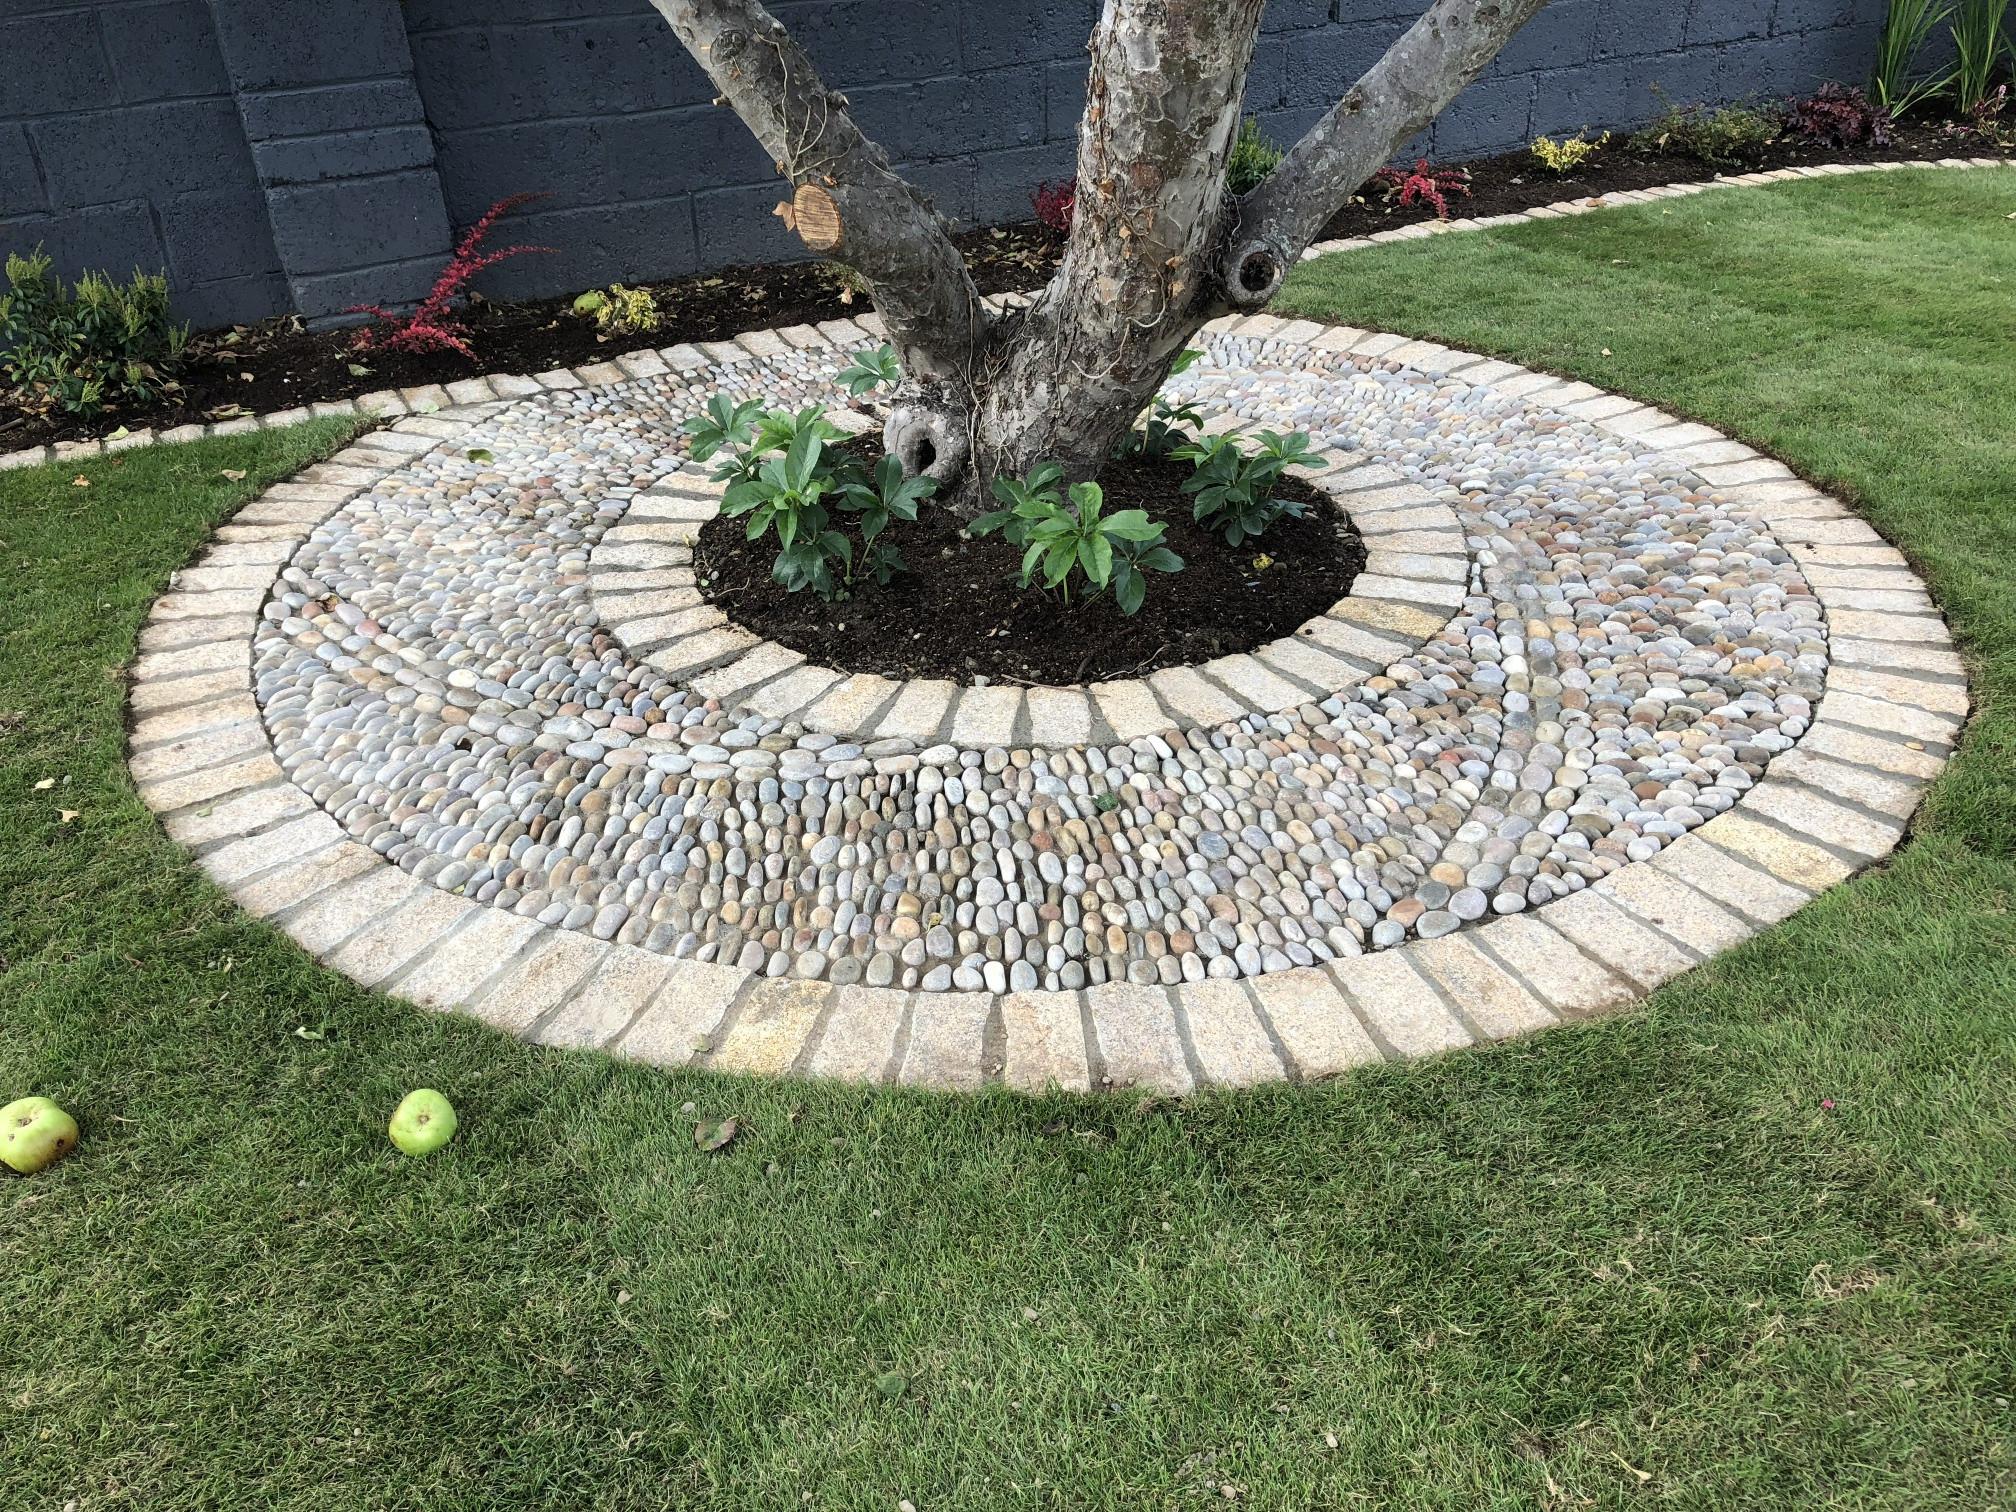 Outdoor Landscape Decor  Garden Design Ideas Inspiration & Advice for all Styles